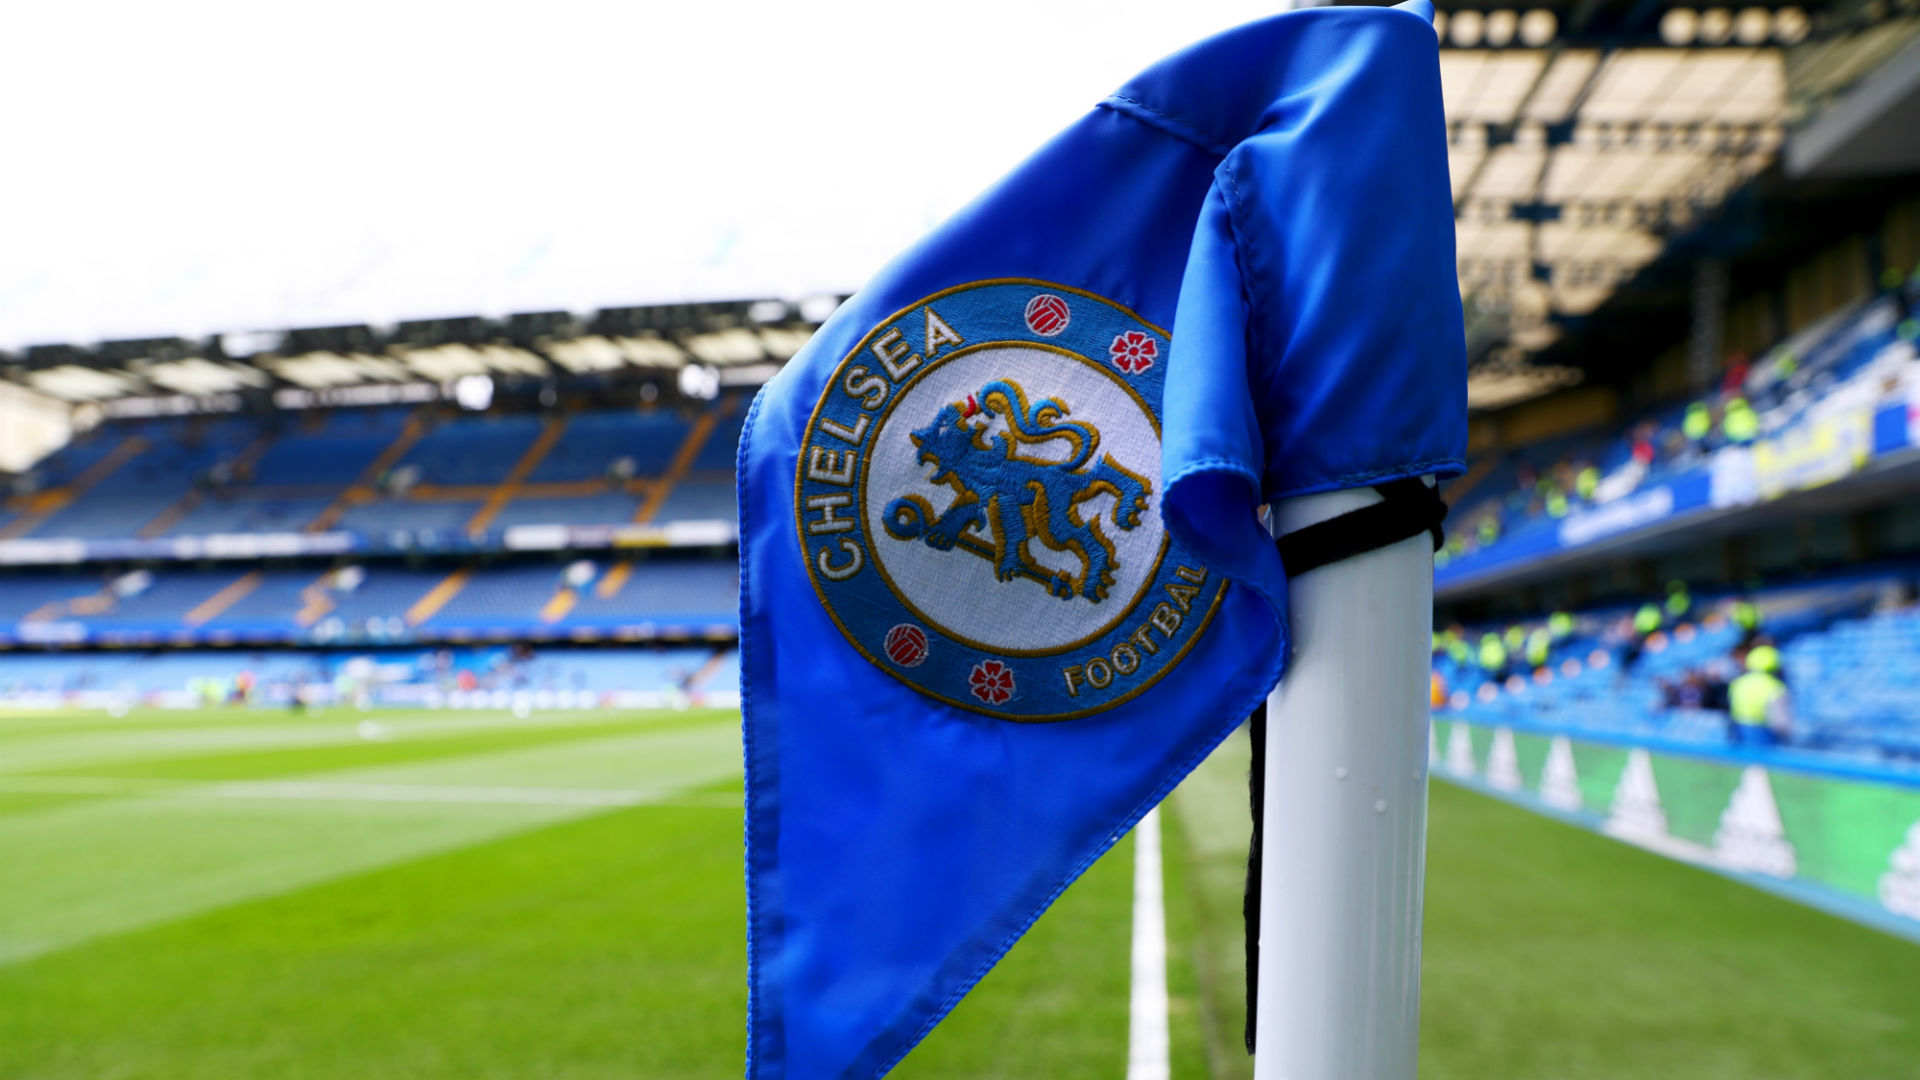 Chelsea announce £32.5m profit despite coronavirus